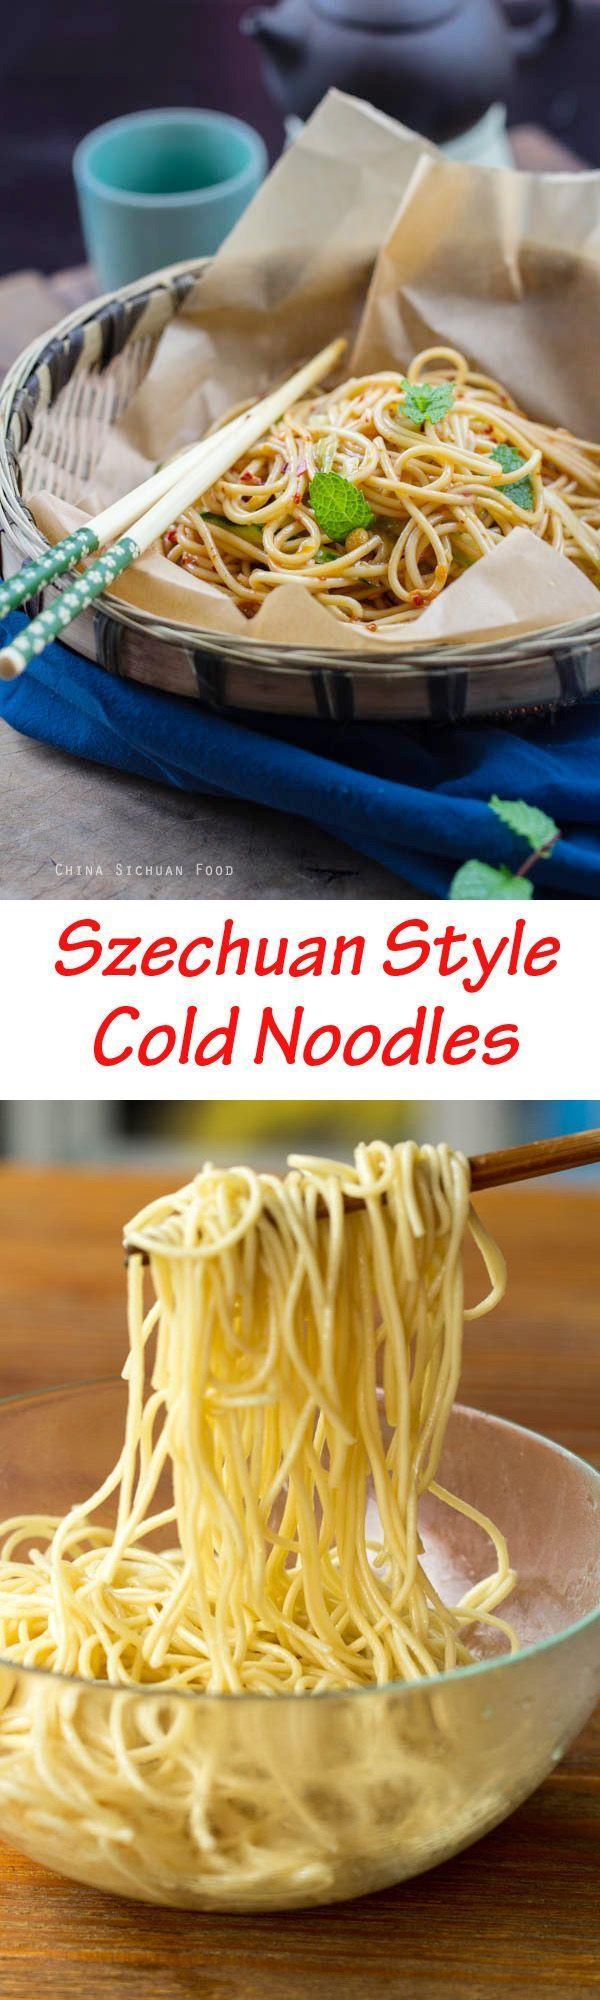 Szechuan Cold Noodles   China Sichuan Food